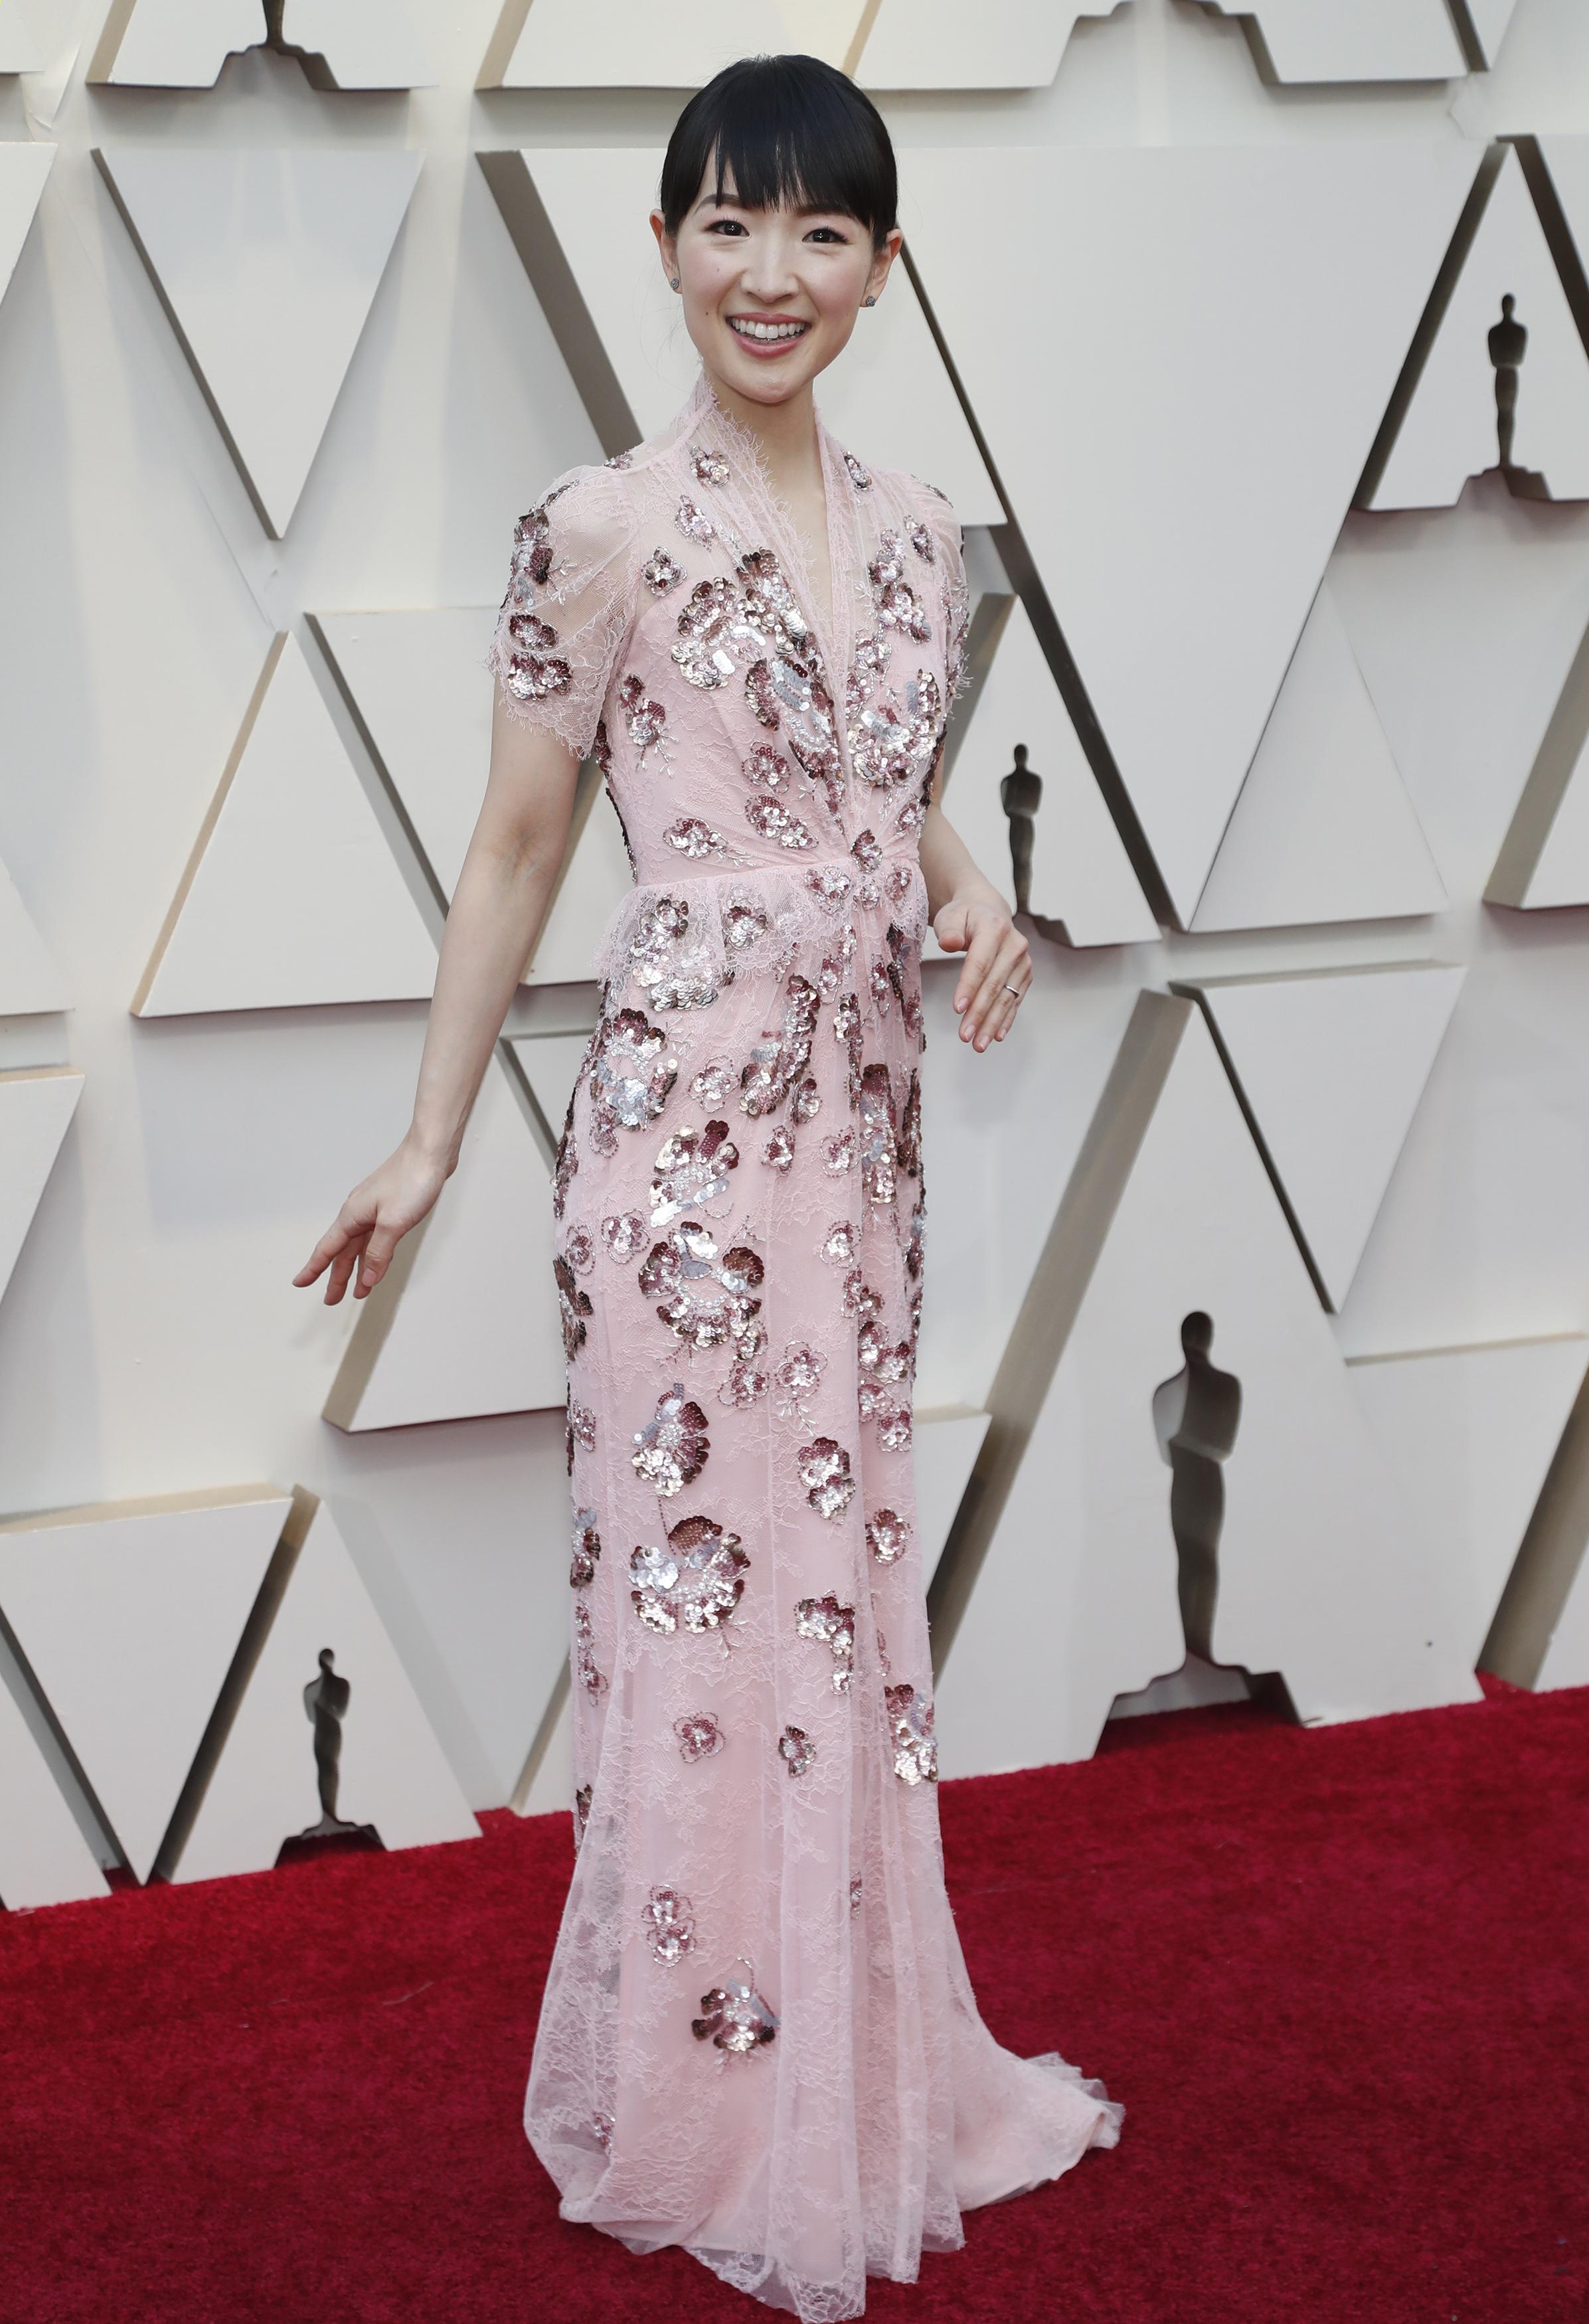 91st Academy Awards - Oscars Arrivals - Red Carpet - Hollywood, Los Angeles, California, U.S., February 24, 2019. Marie Kondo. REUTERS/Mario Anzuoni - HP1EF2O1PCT2U